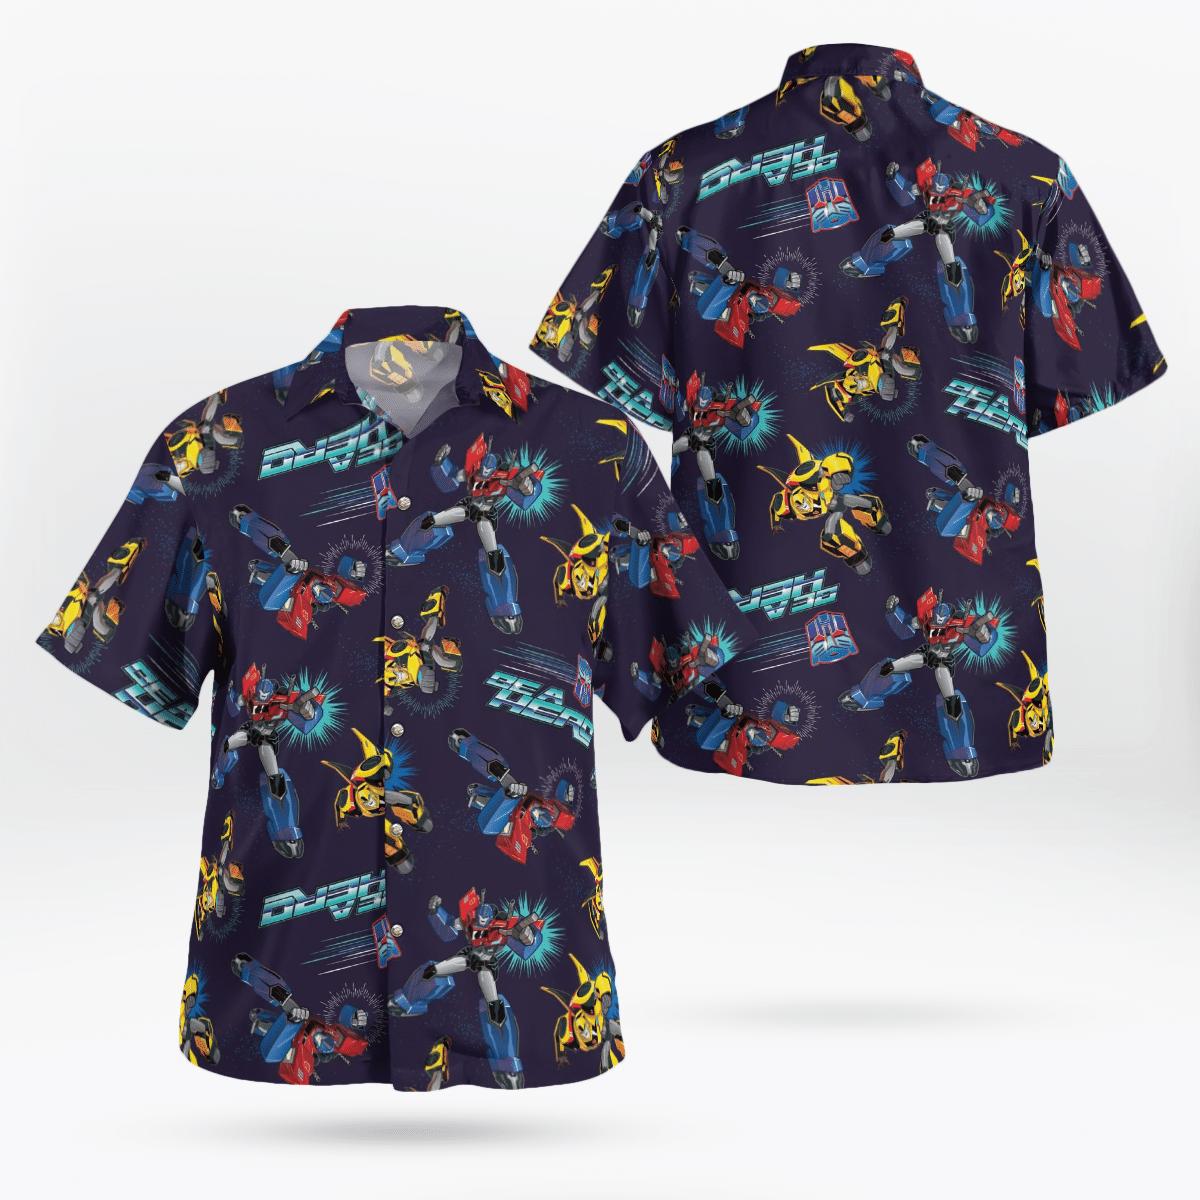 Transformers BEA Hero Hawaiian Shirts Summer Shirt